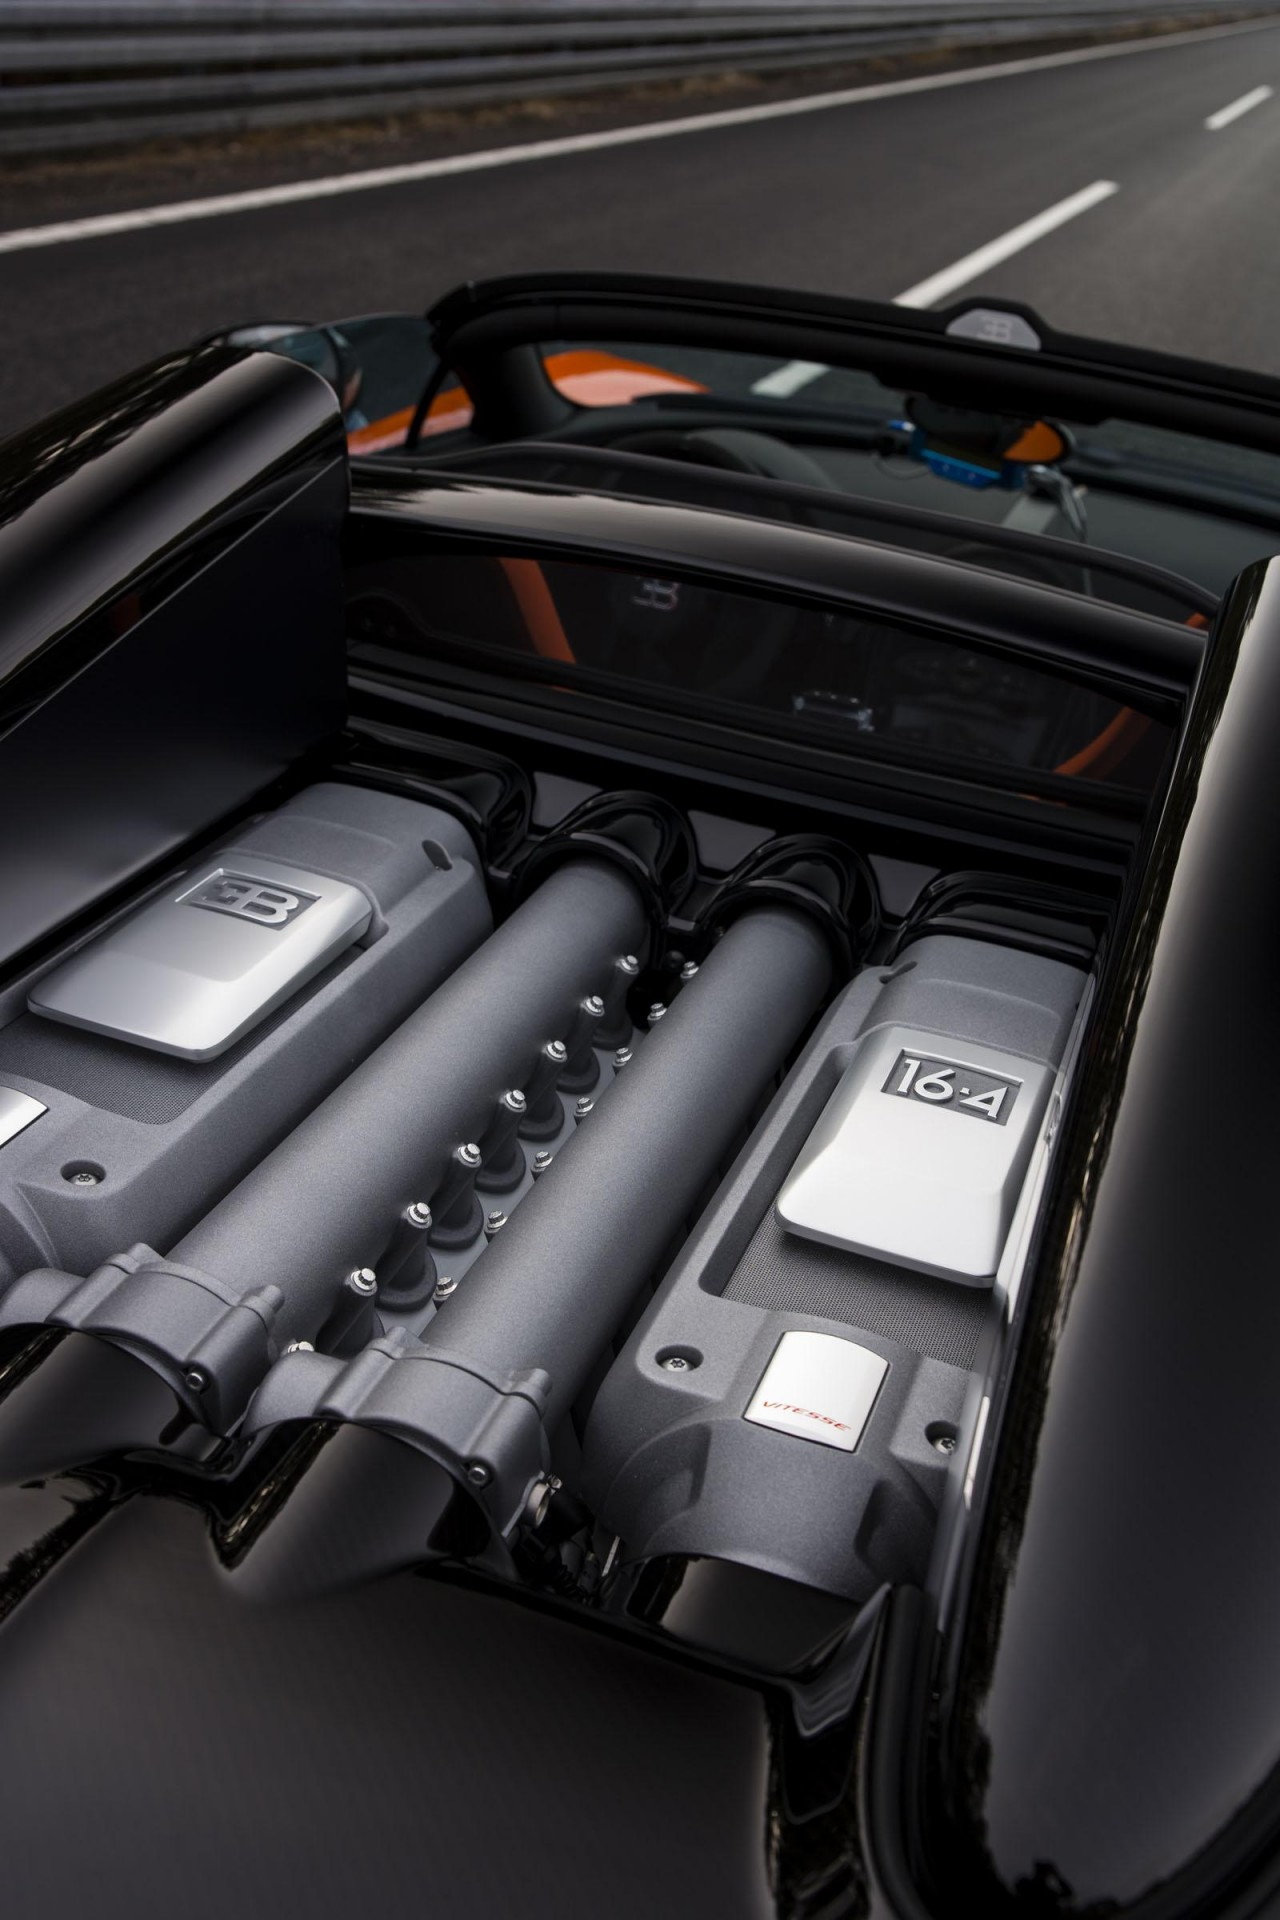 Bugatti-Veyron-Grand-Sport-Vitesse-WRC-engine-1280x1920 Inspiring Bugatti Veyron Grand Sport Vitesse Wrc Cars Trend